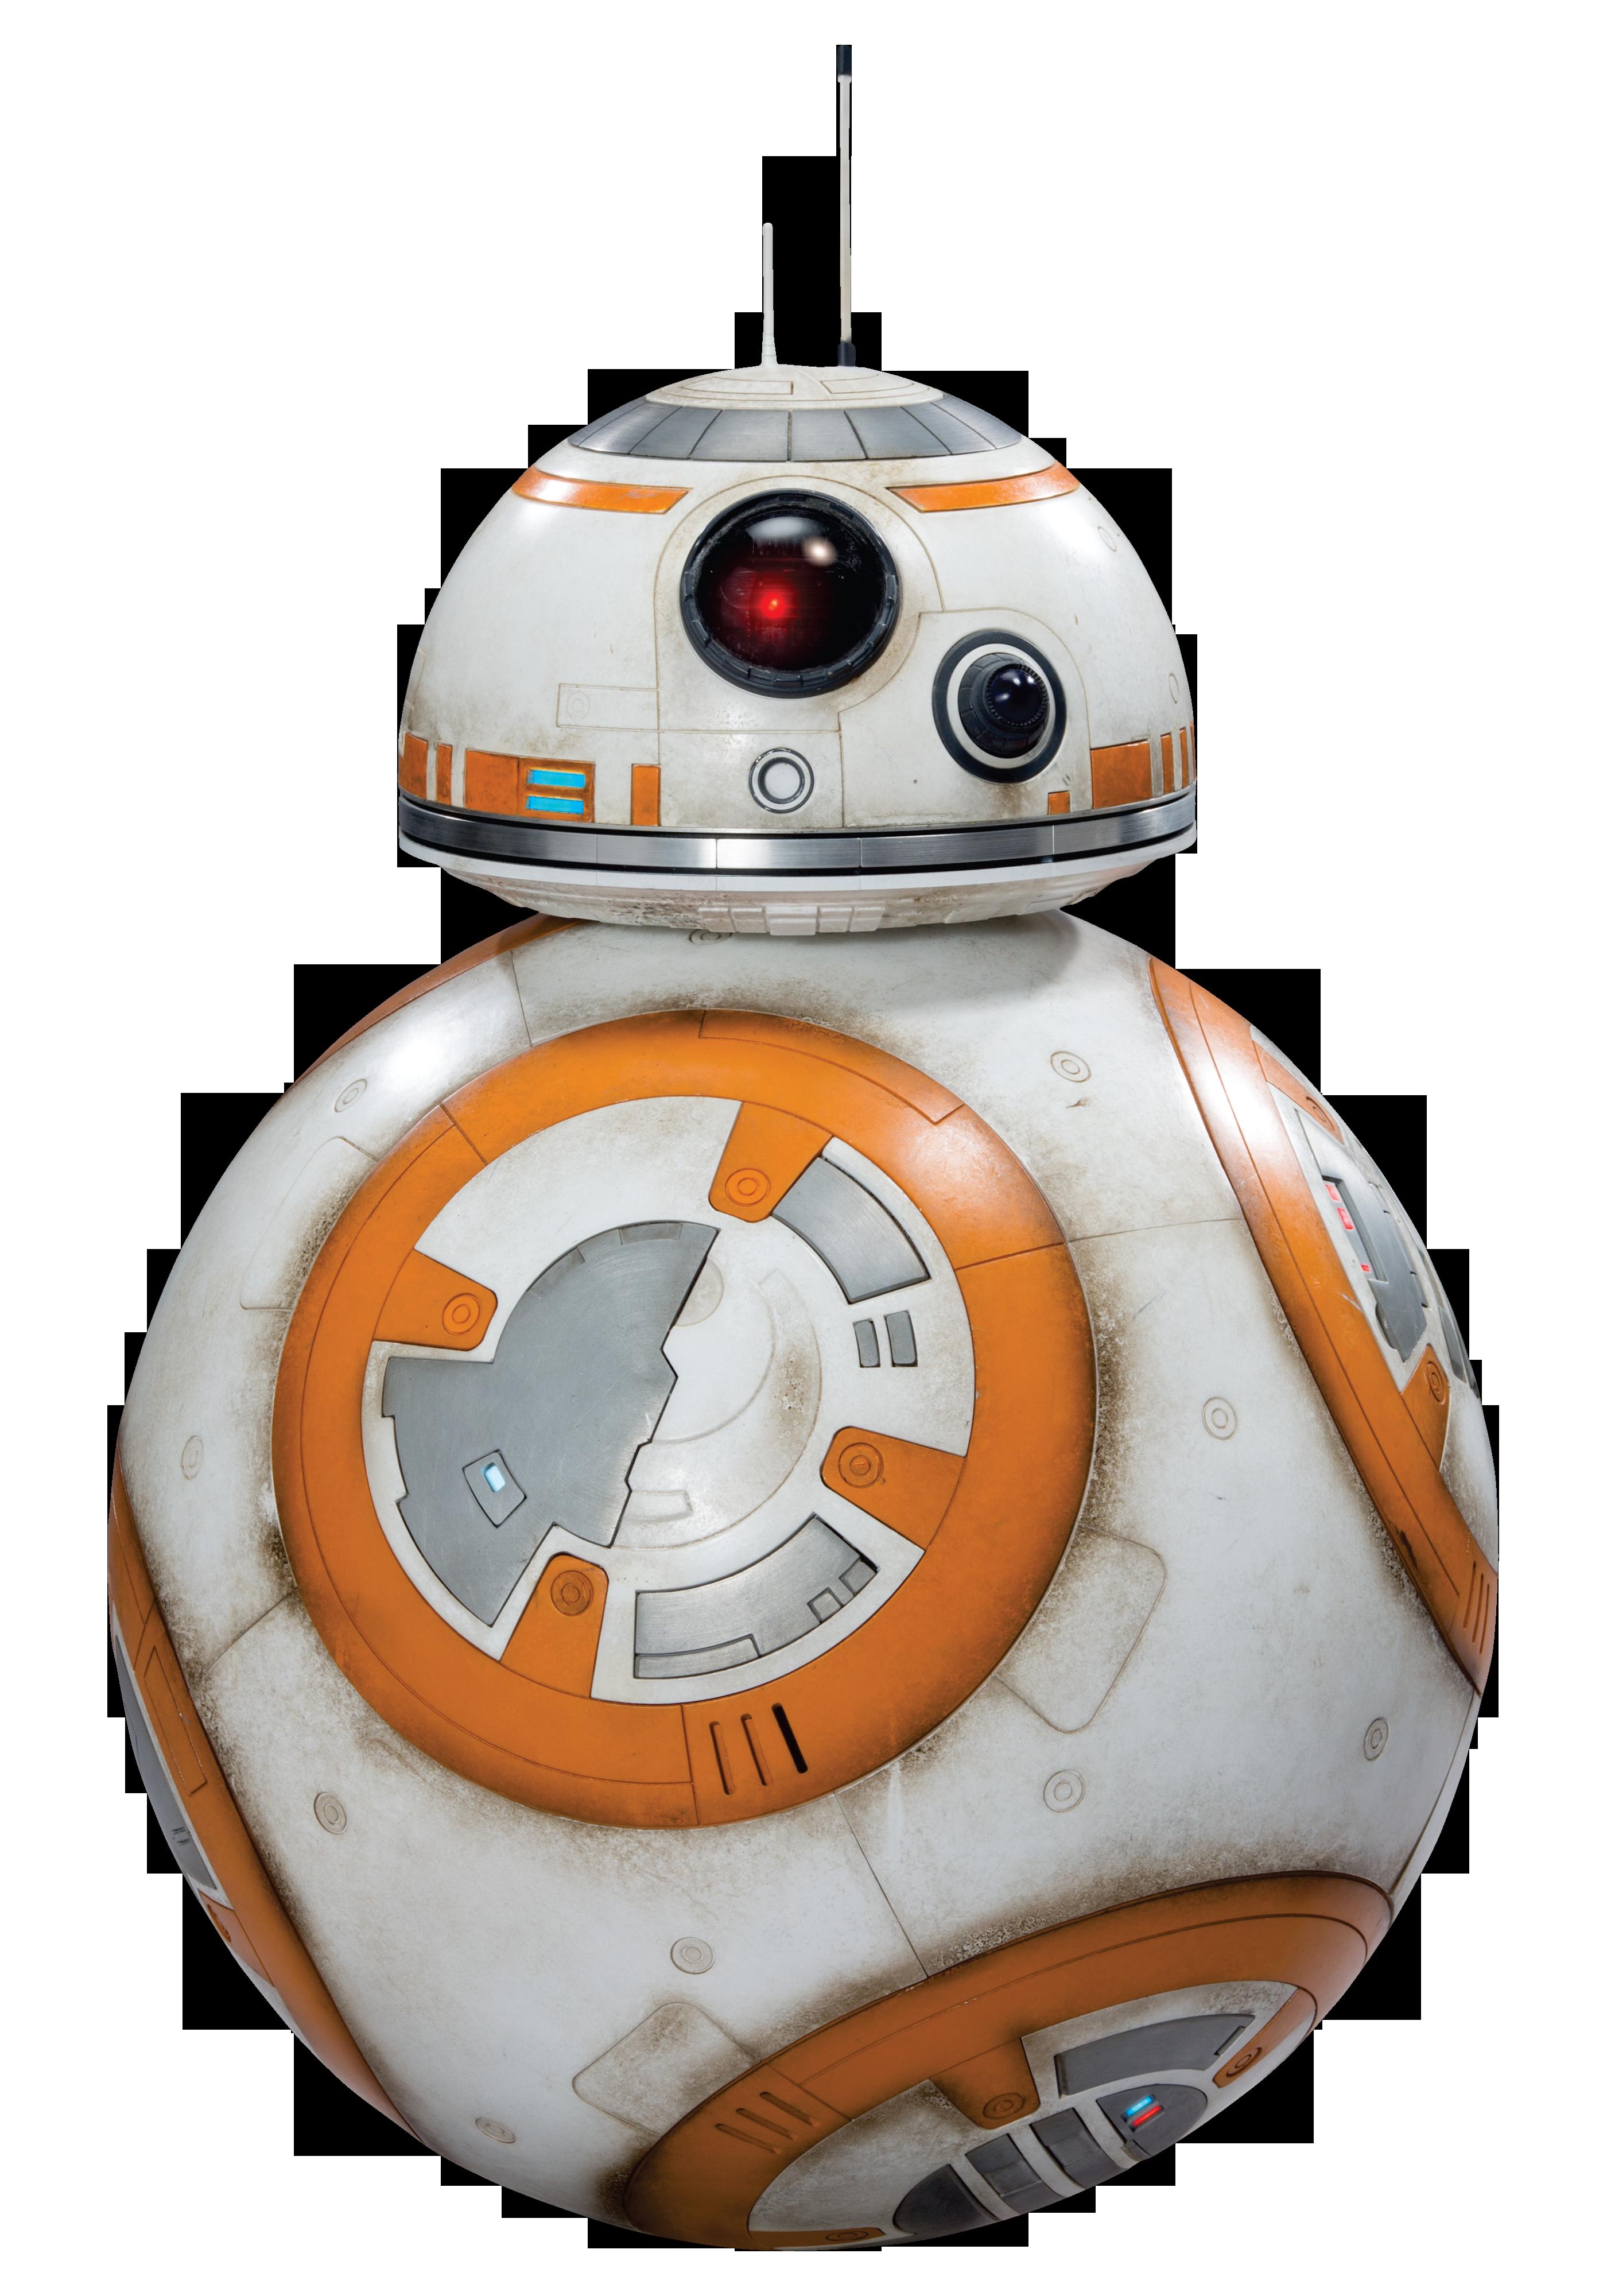 Ficheiro Bb 8 Star Wars The Force Awakens Jpg Wikipedia A